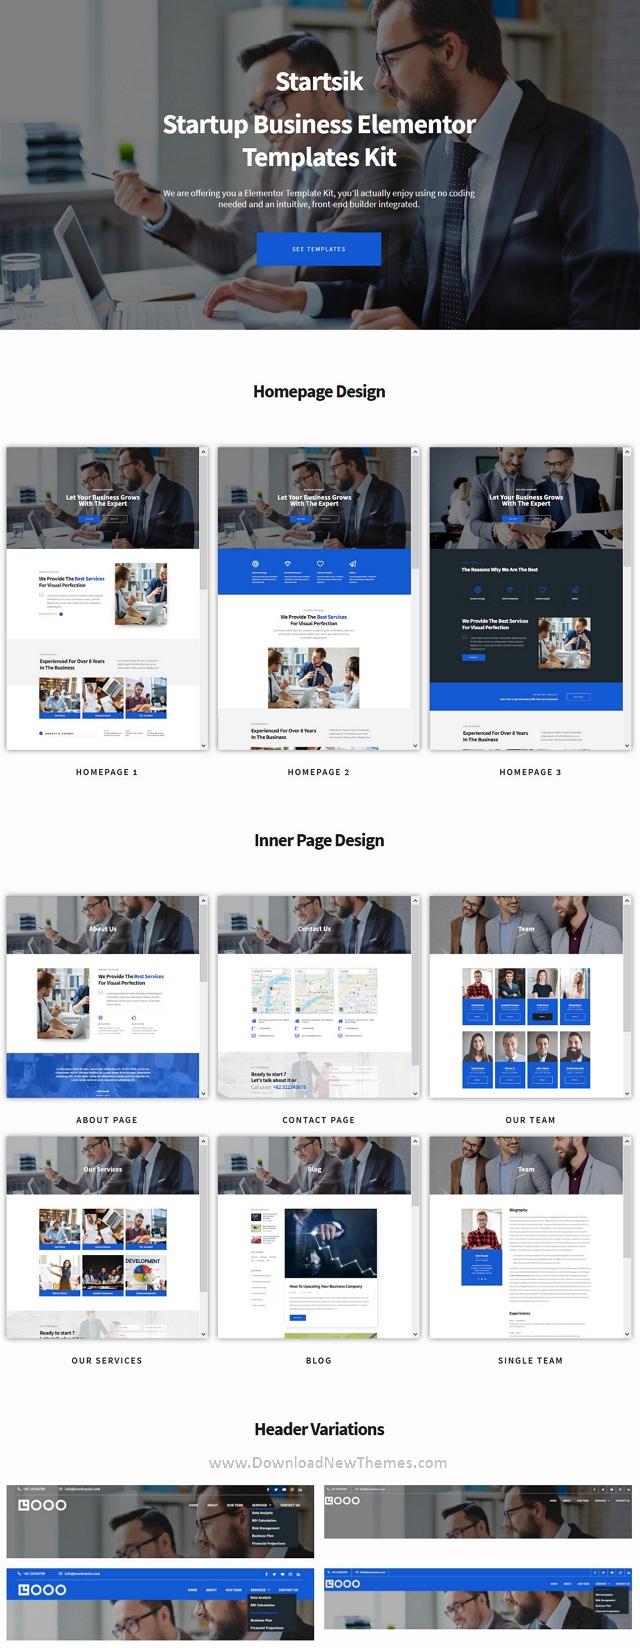 Startup Business Elementor Template Kit